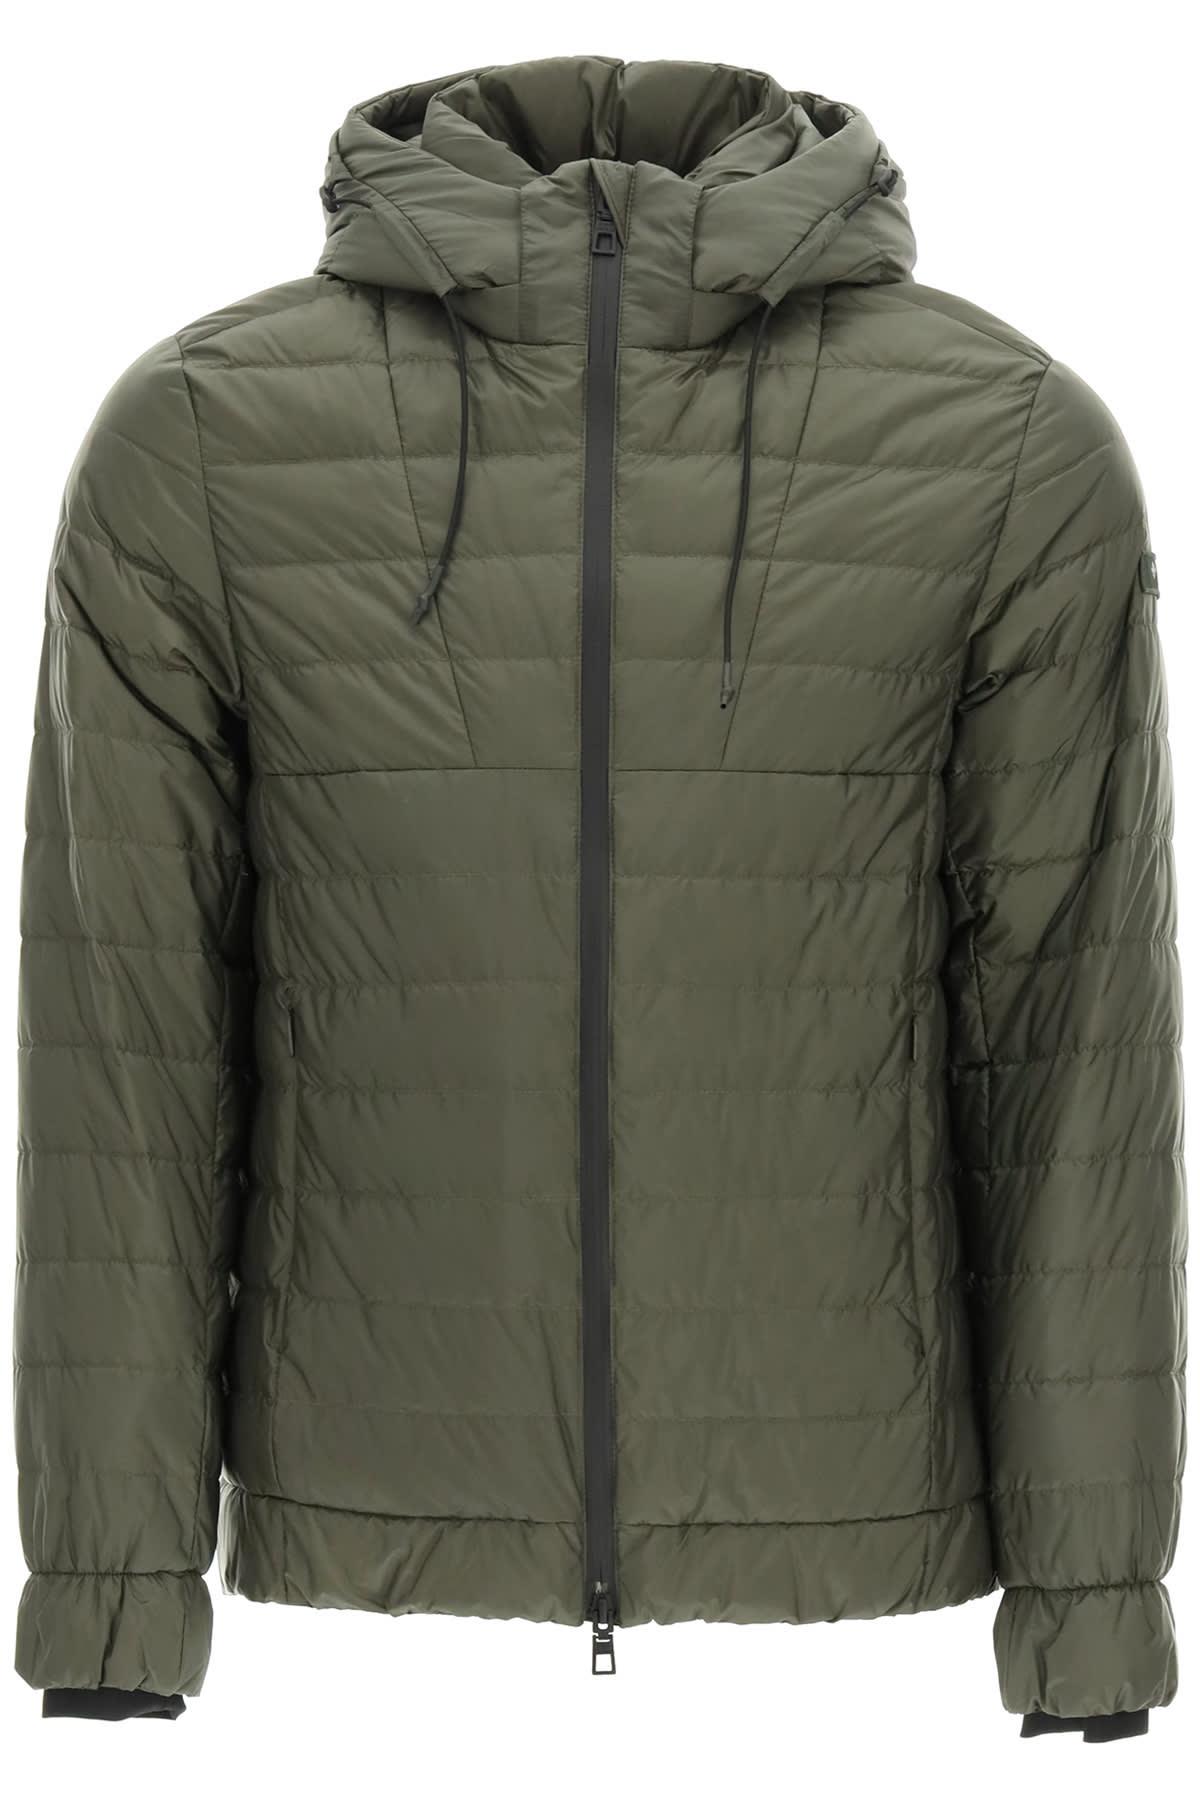 Tatras Clothing ARES ULTRALIGHT DOWN JACKET